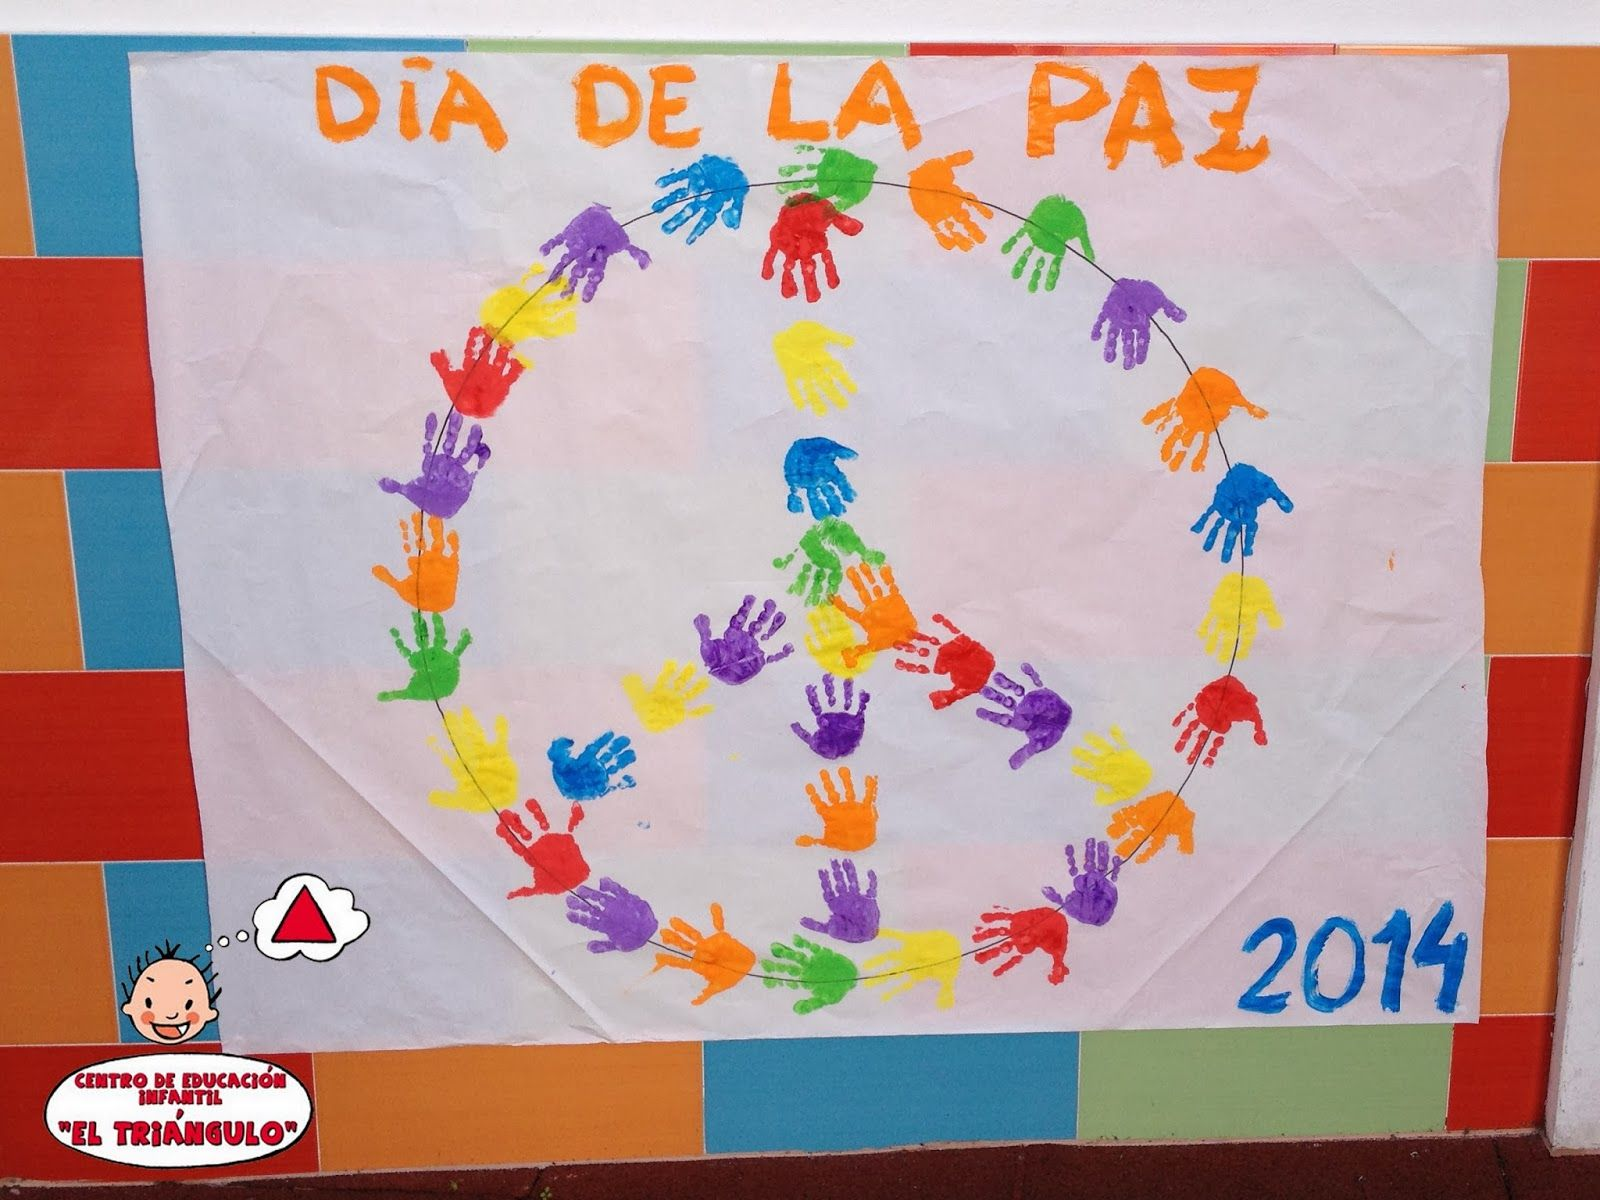 40 Ideas De Día De La Paz Dia De La Paz Paz Paloma De La Paz